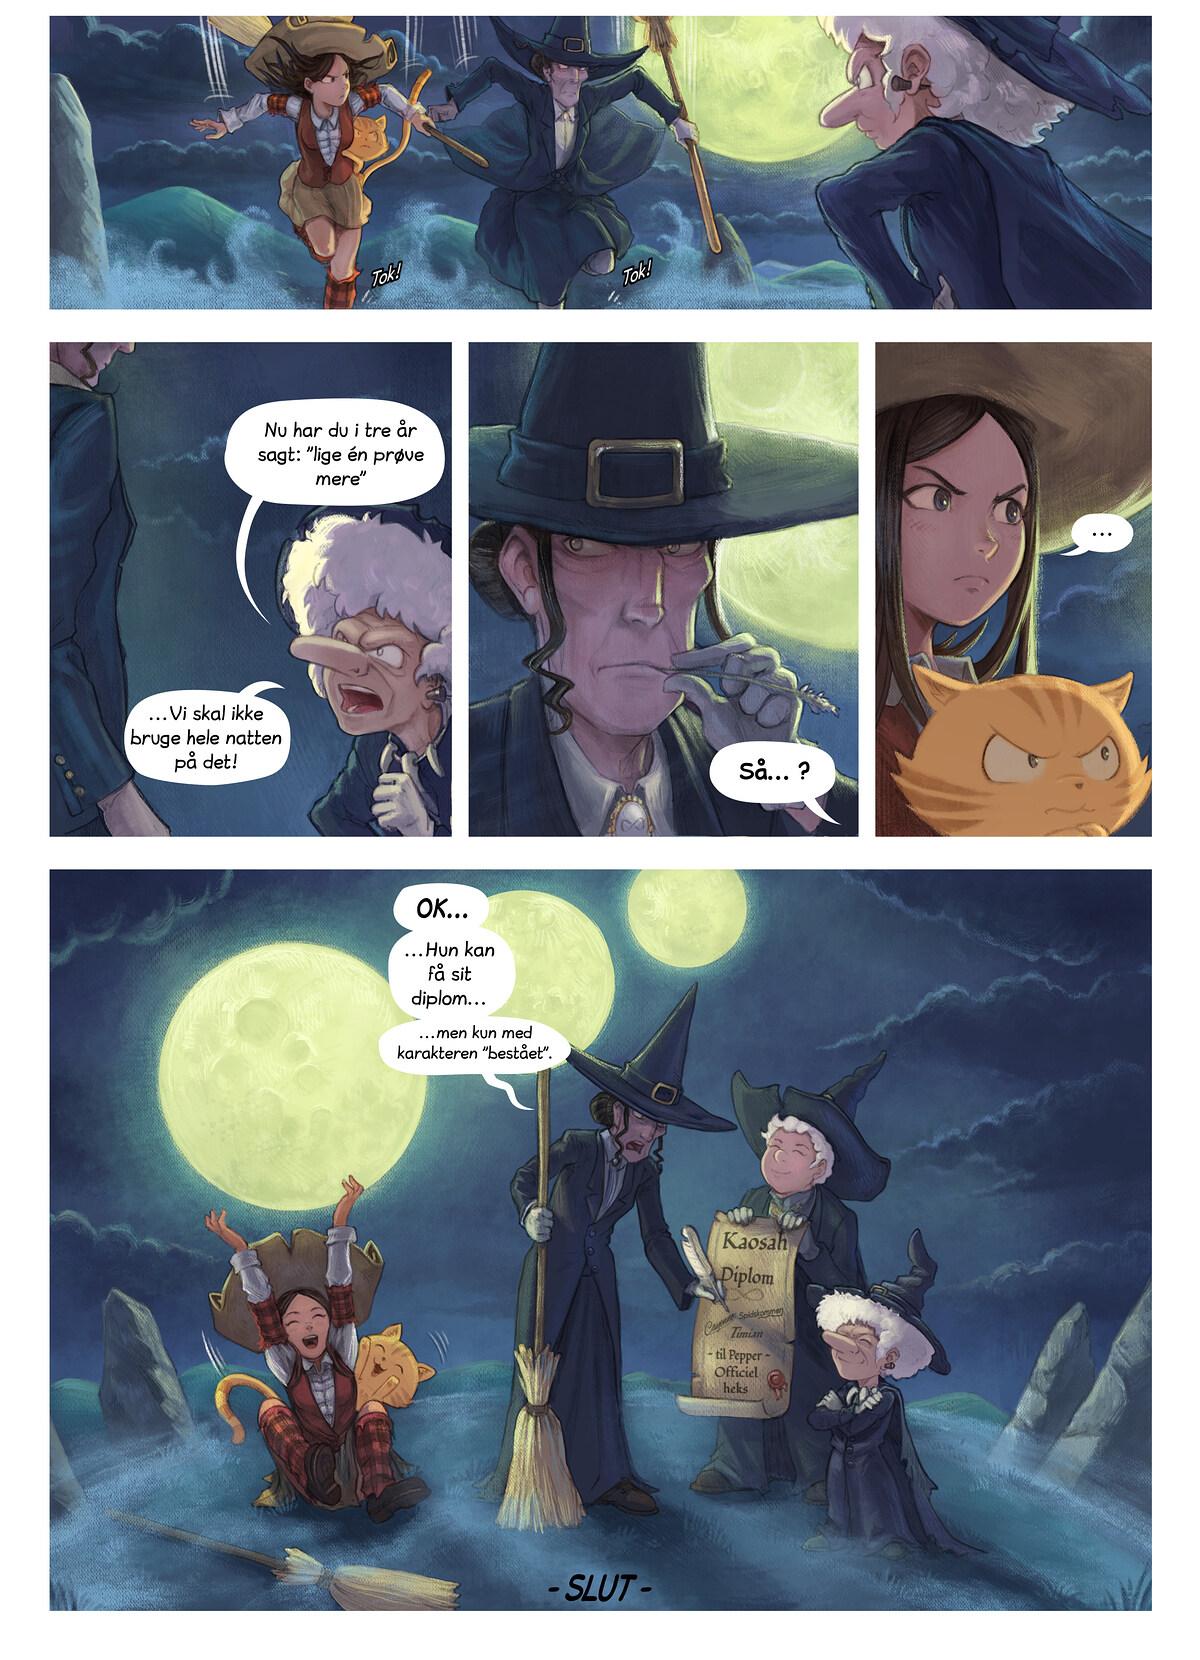 Episode 31: Kampen, Page 7